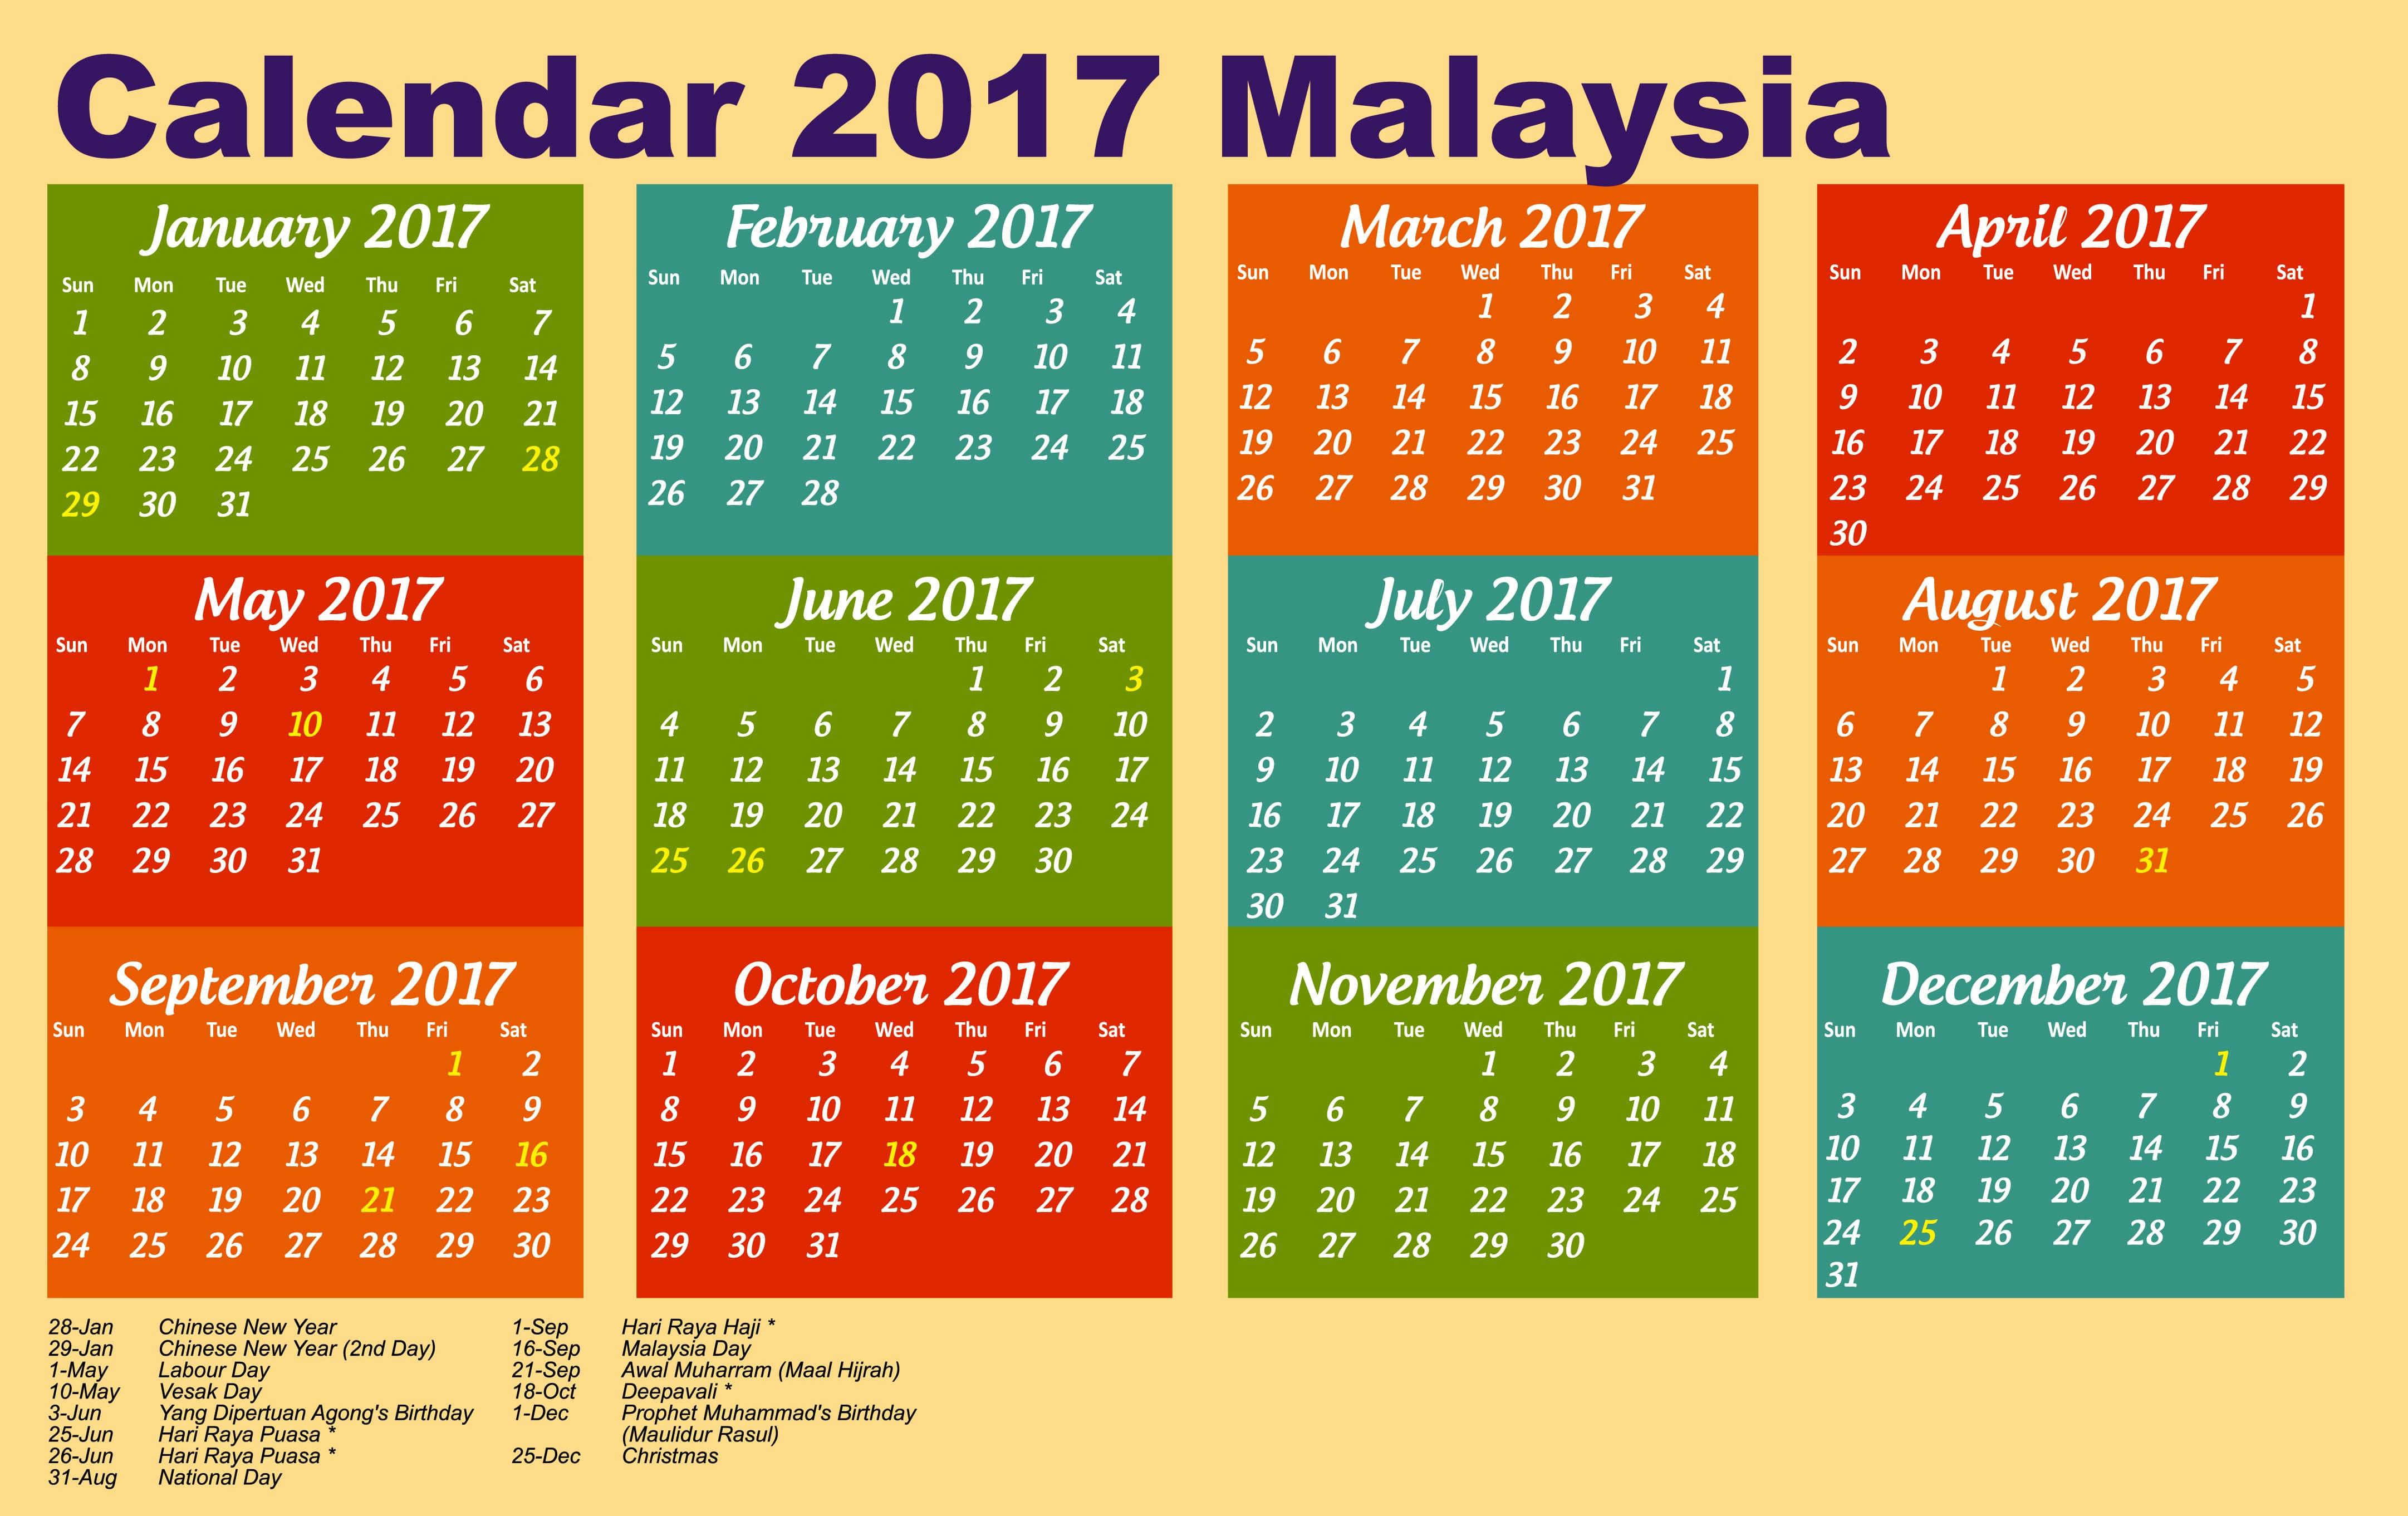 calendar 2017 Malaysia with public holiday